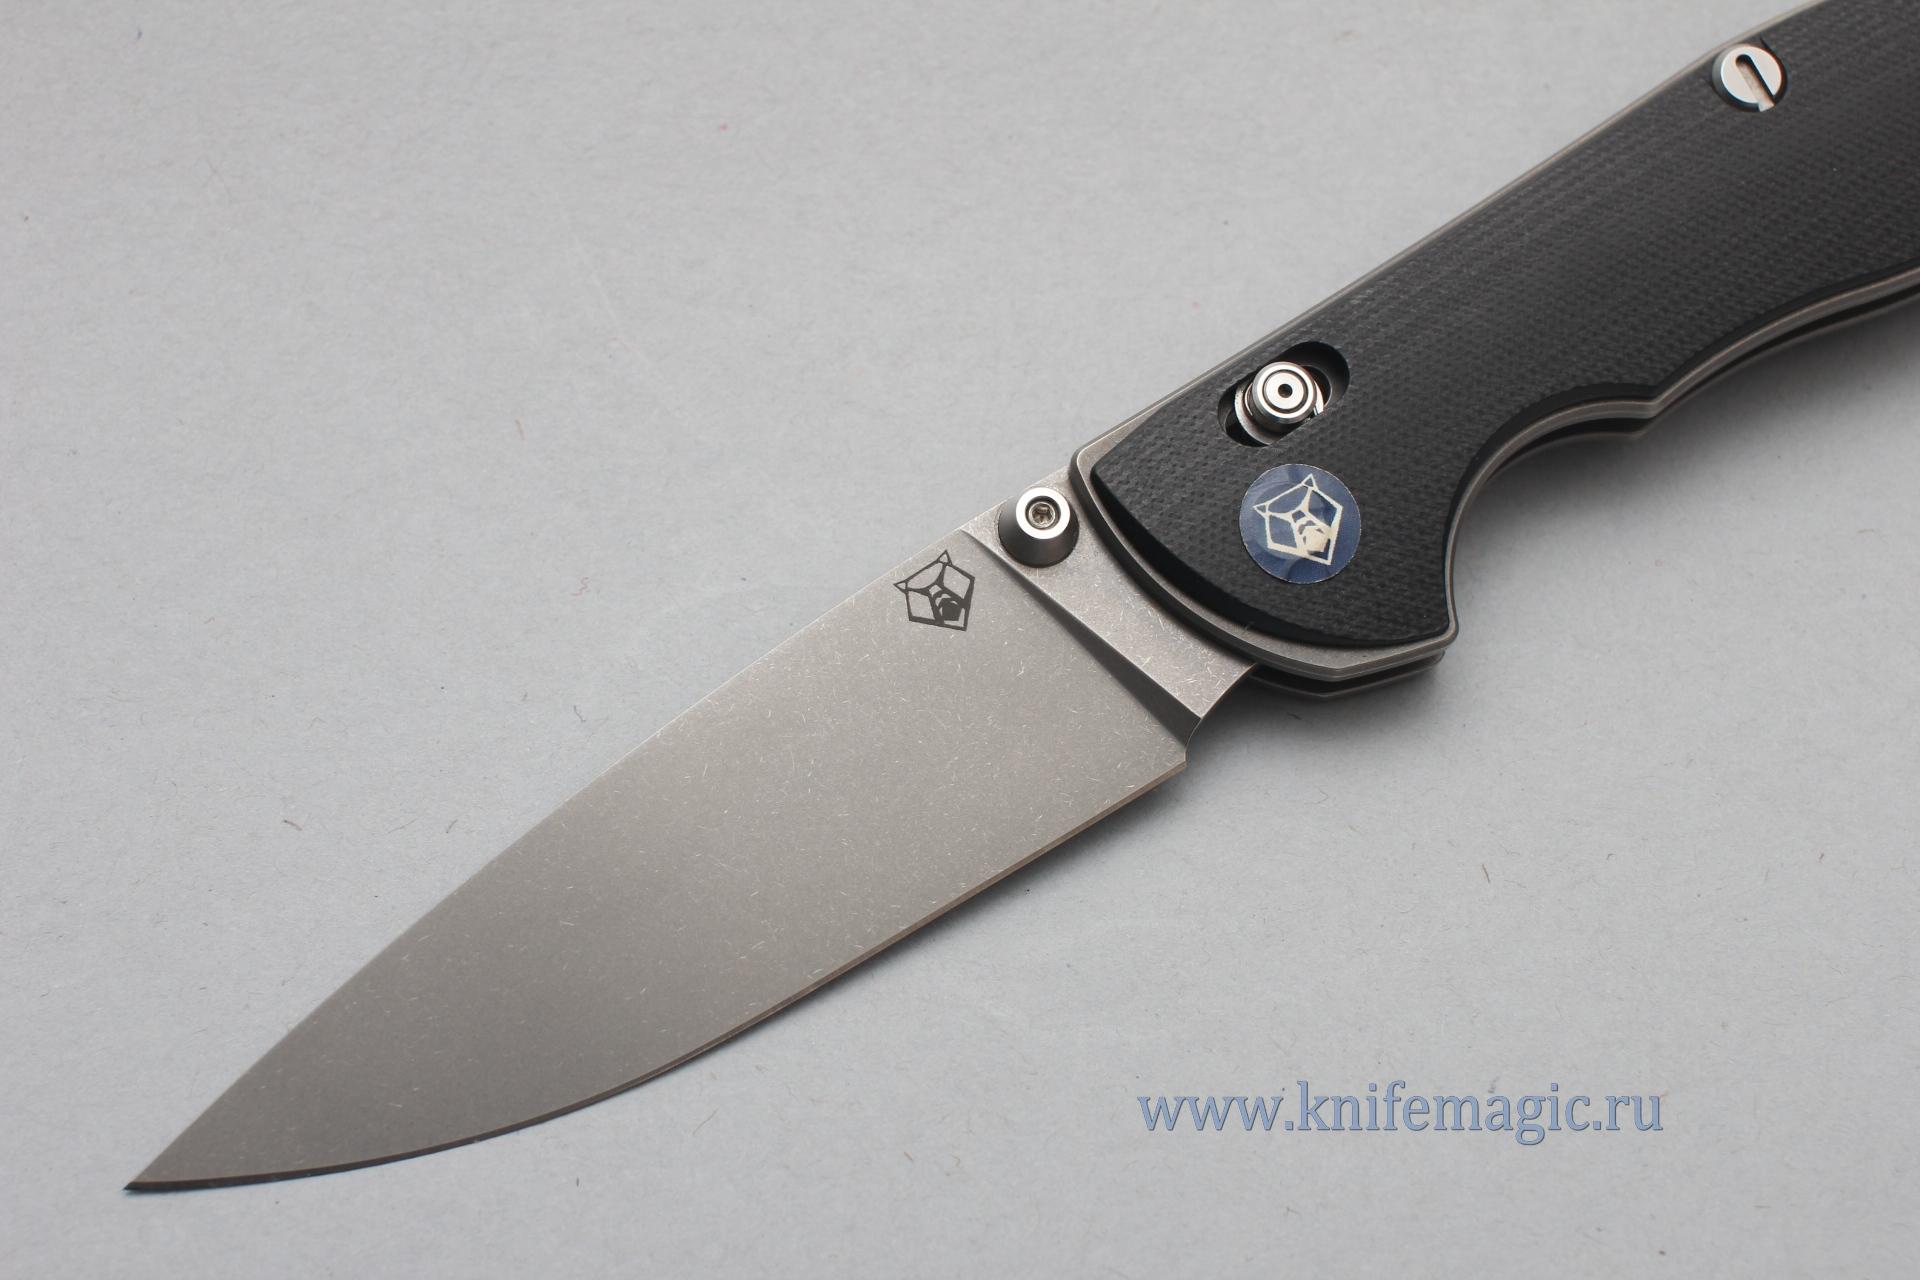 Нож Широгоров Табарган 100NS vanax 35 G10 черная